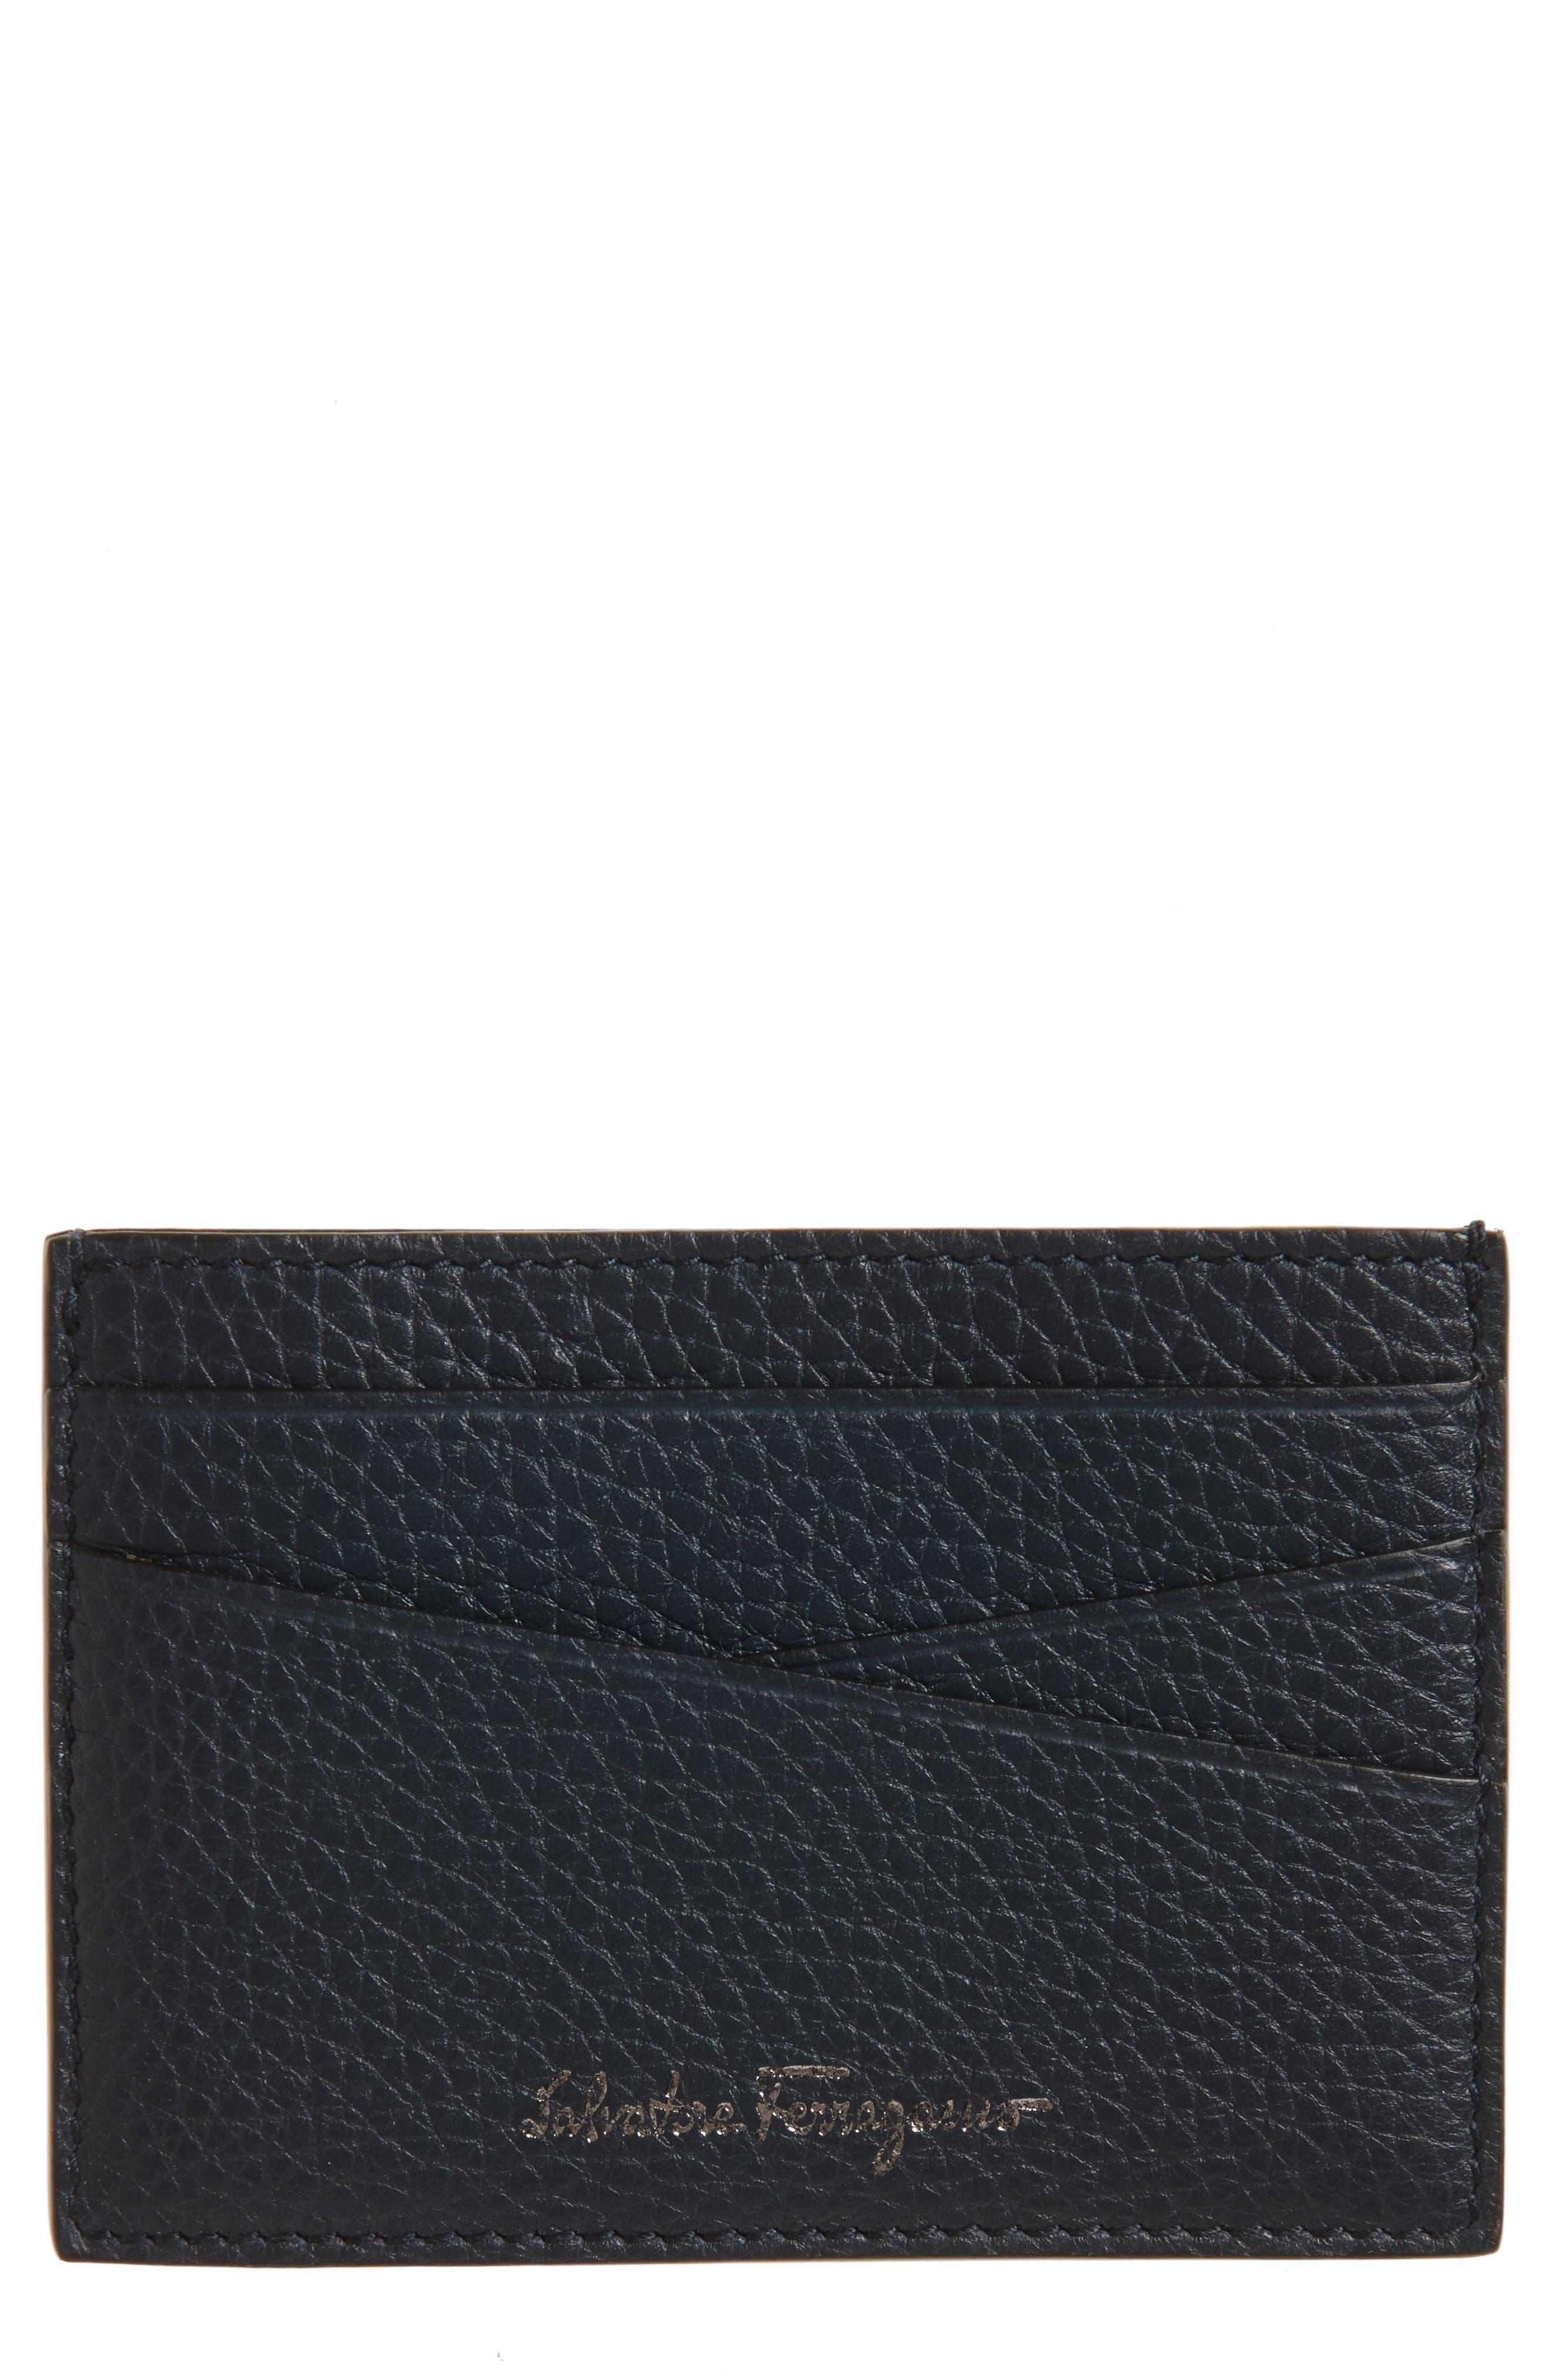 Salvatore Ferragamo Firenze Leather Card Case